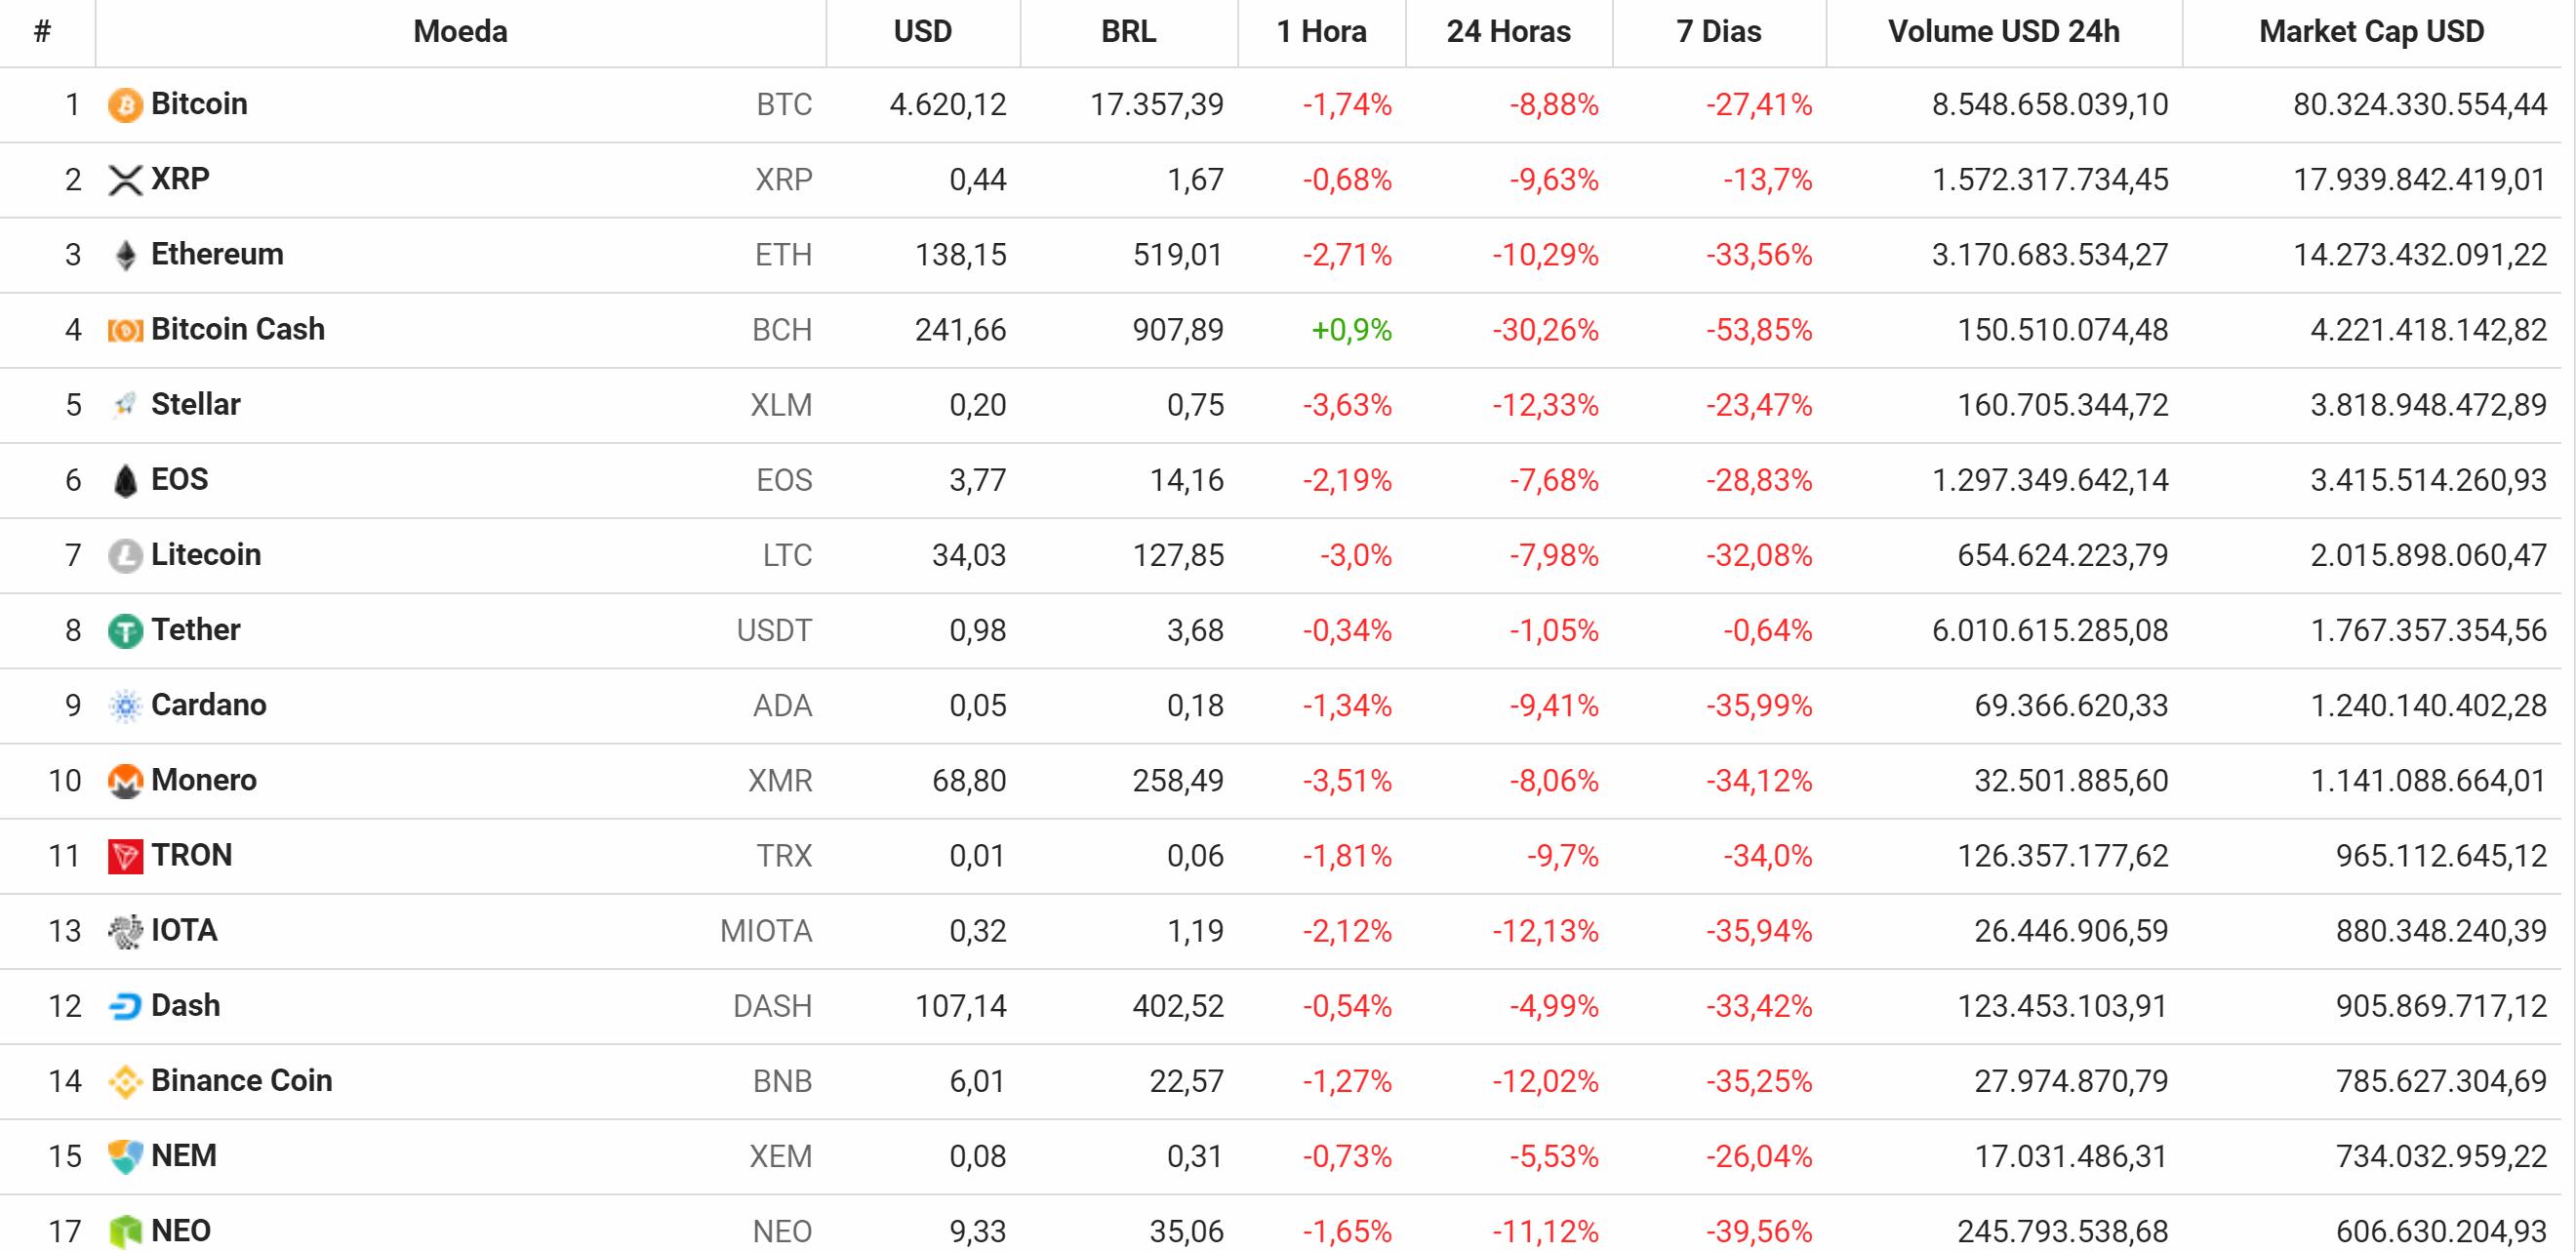 Preços das principais criptomoedas